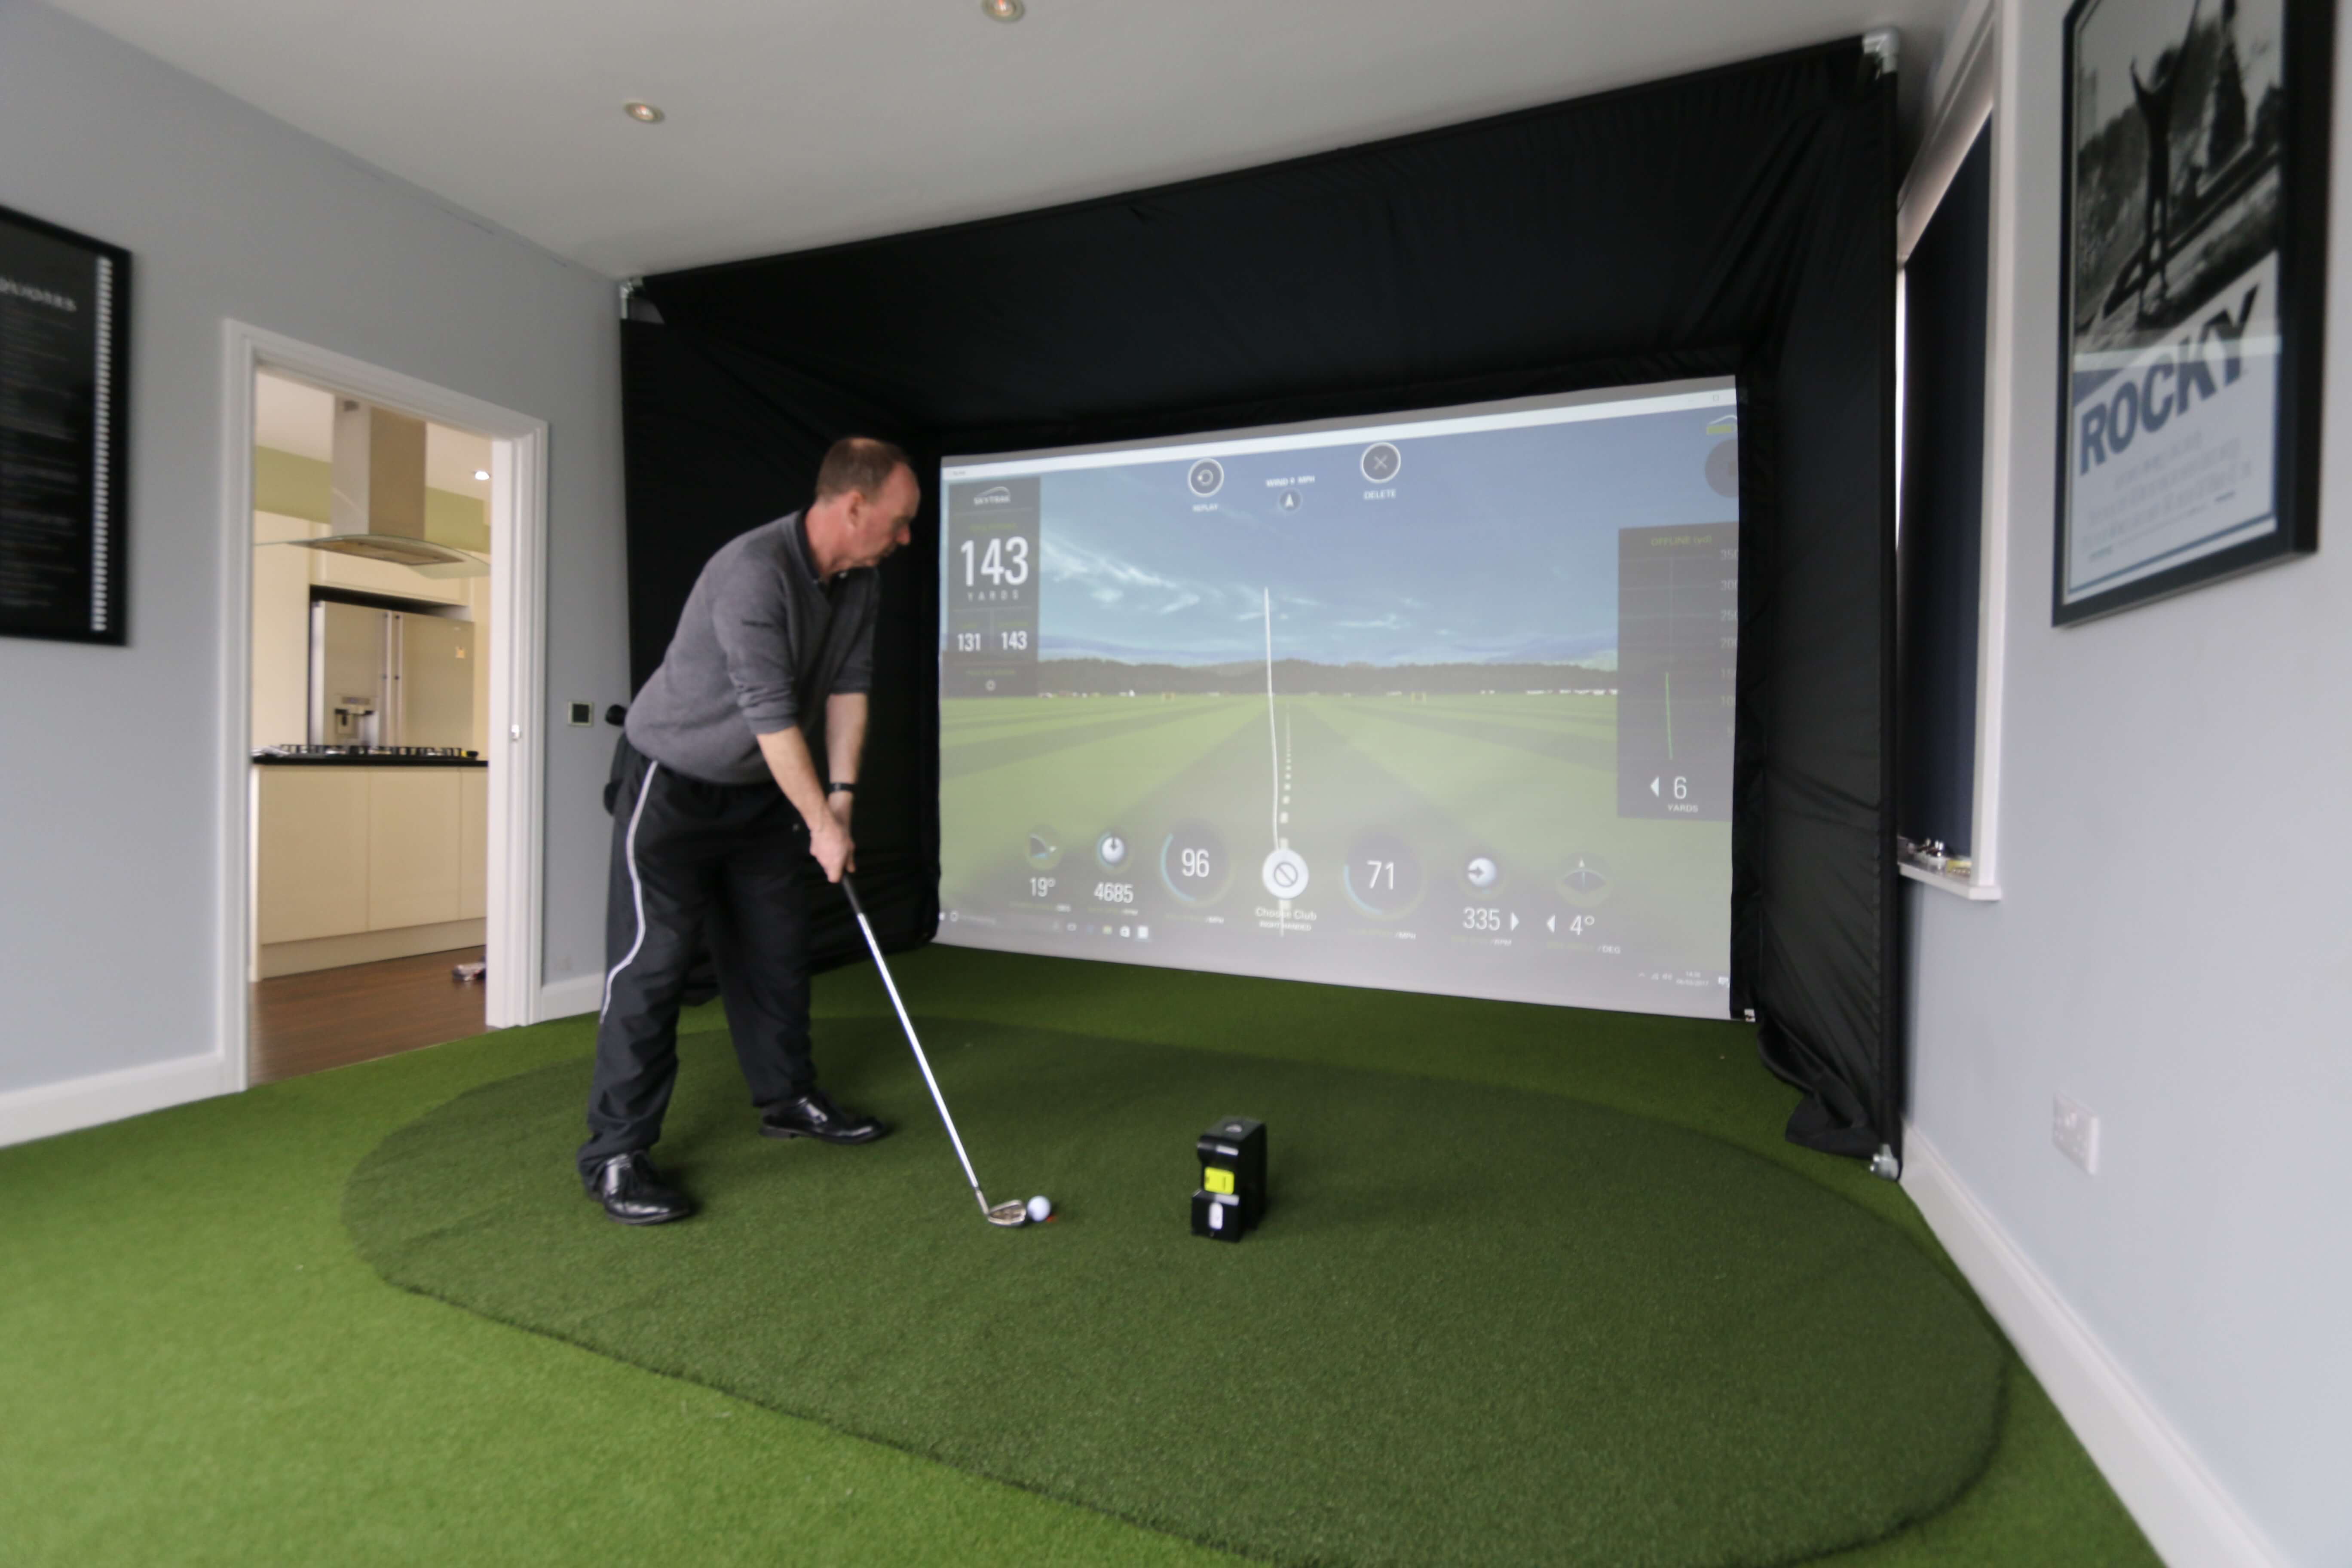 Skytrak Full System Golf Simulator Golf Swing Systems